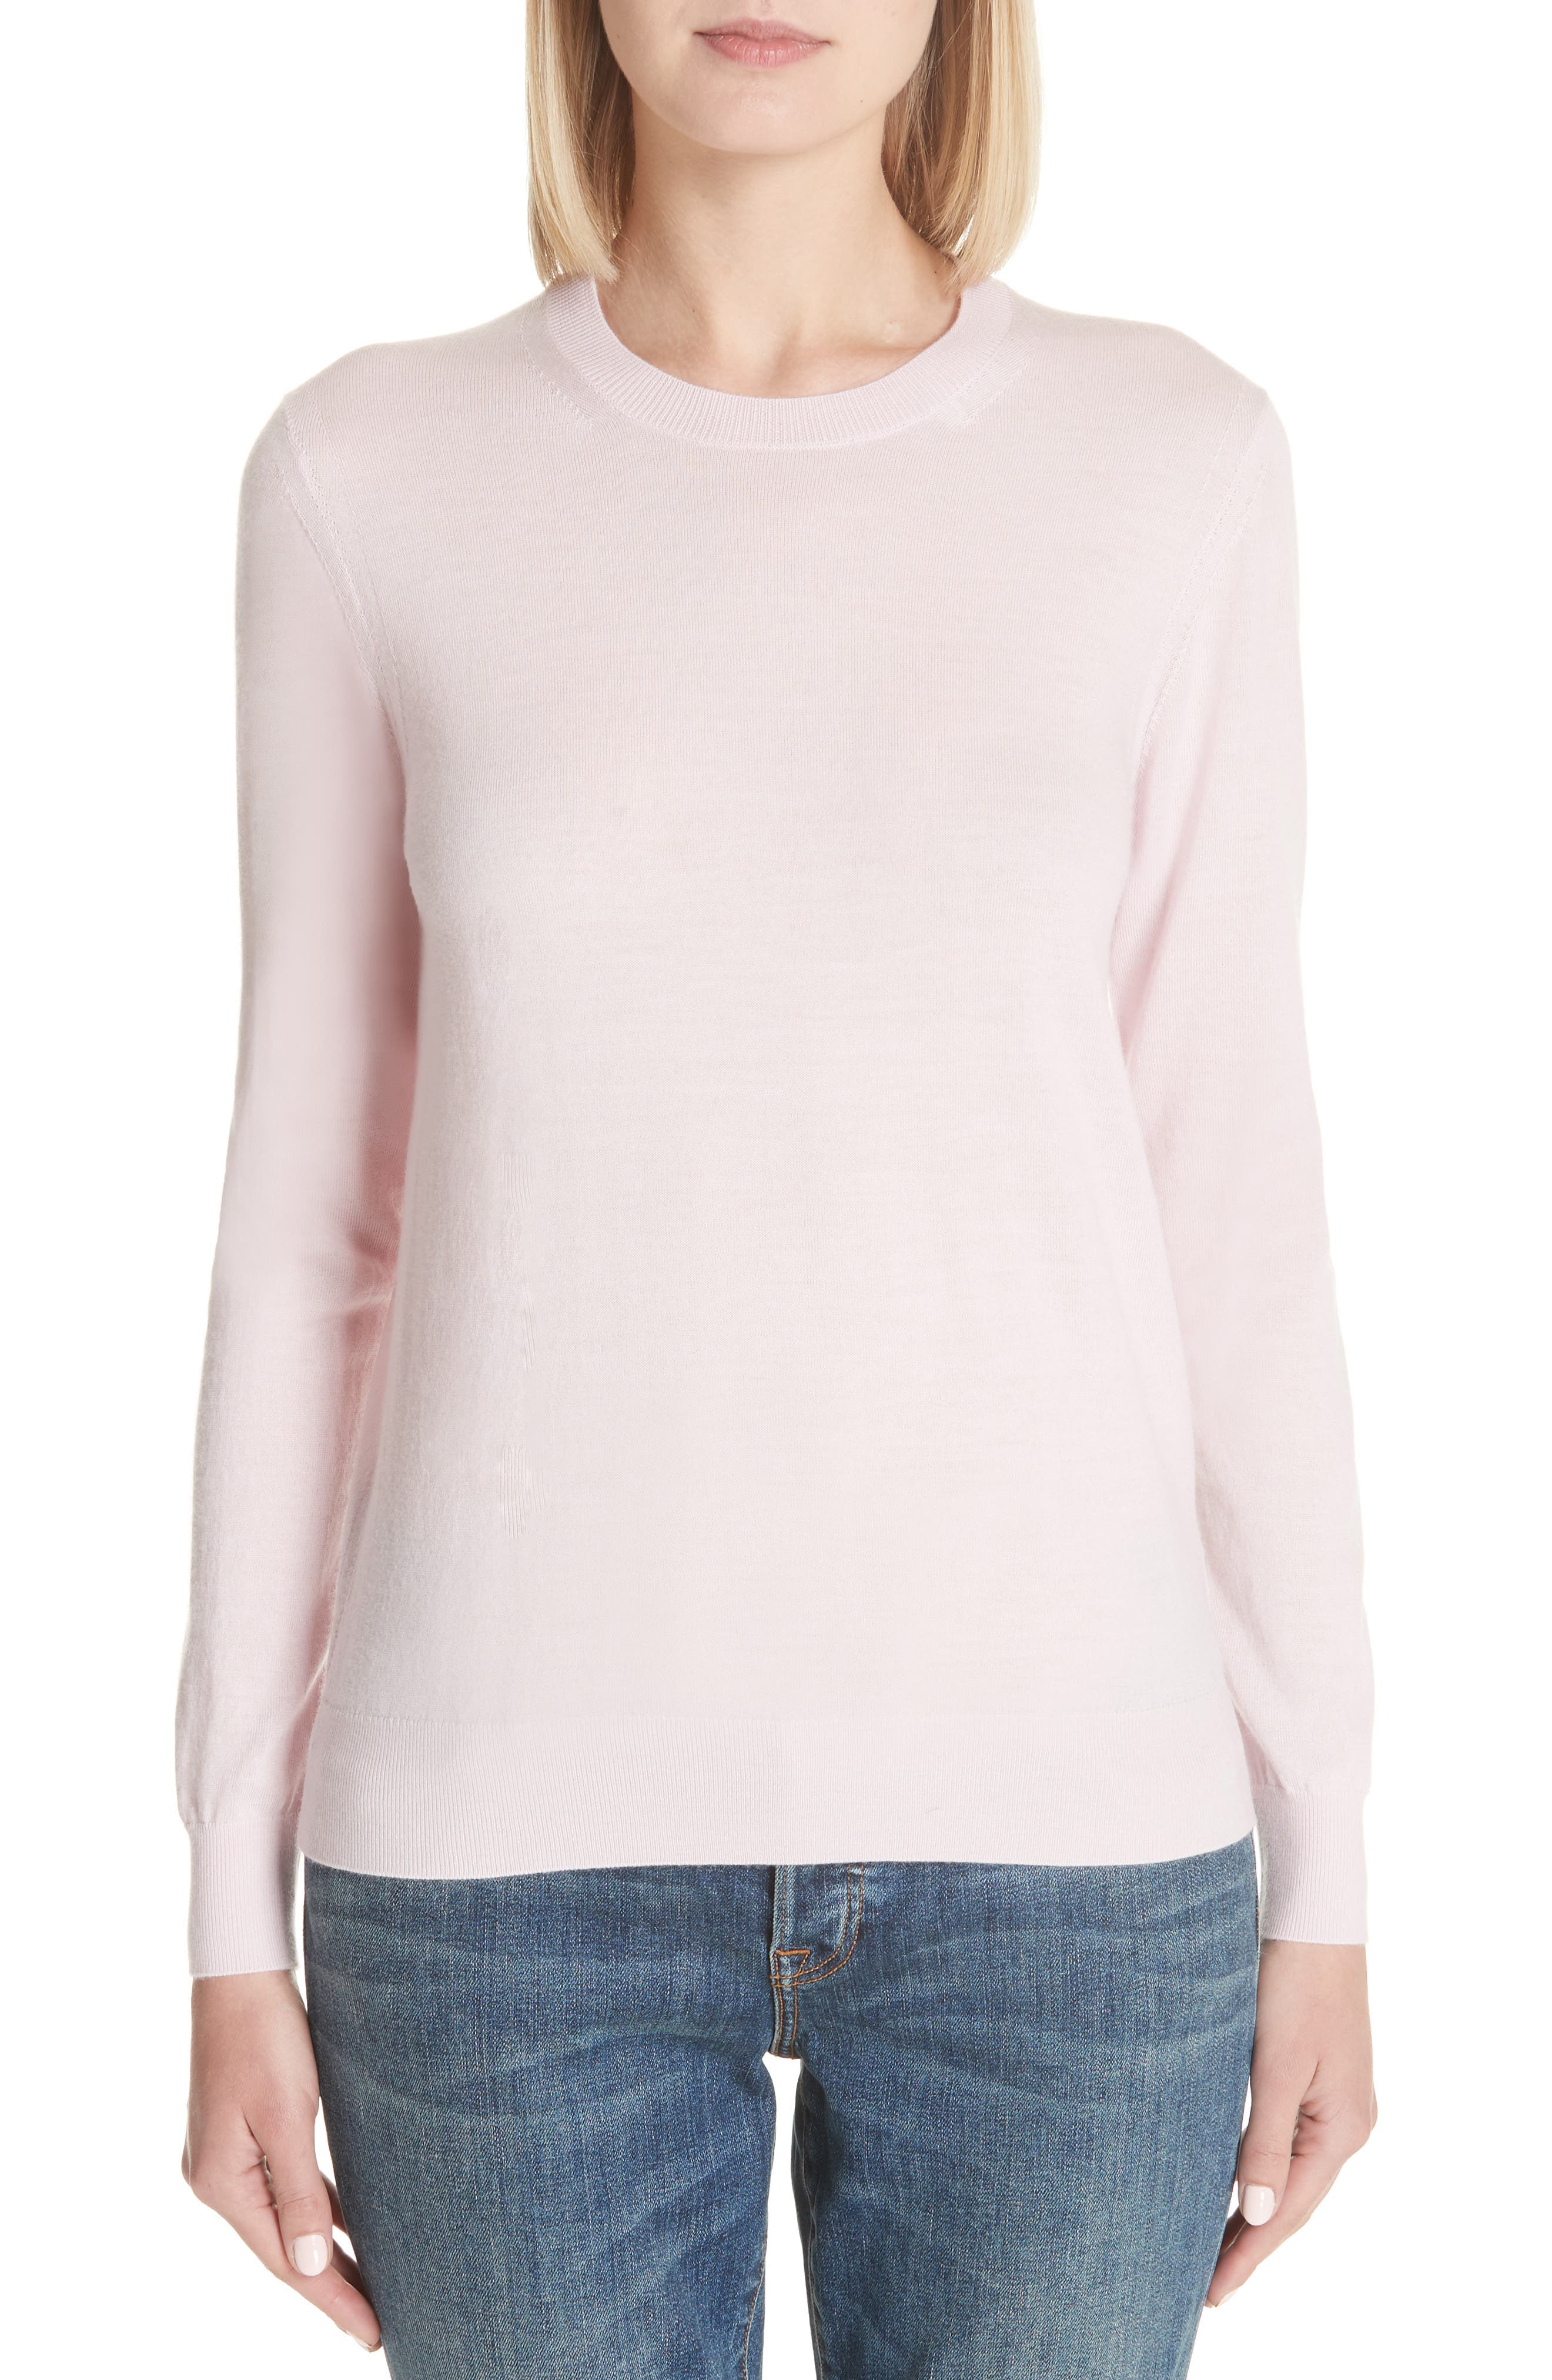 Viar Merino Wool Sweater,                             Main thumbnail 1, color,                             Light Pink